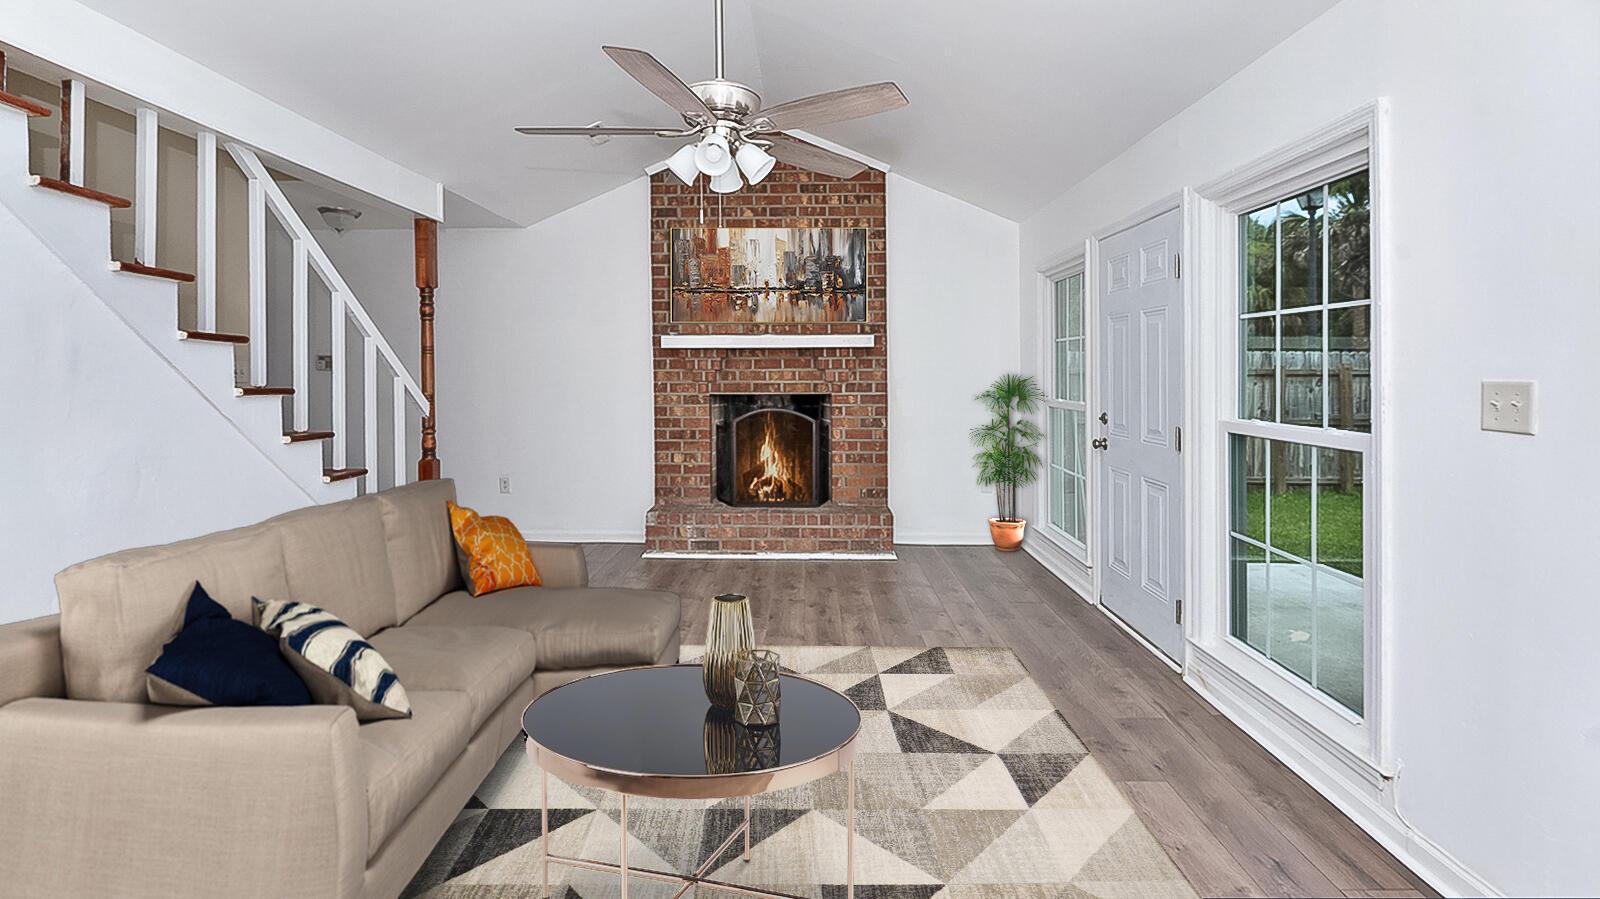 Ashley Villas Homes For Sale - 4315 Briarstone, North Charleston, SC - 8